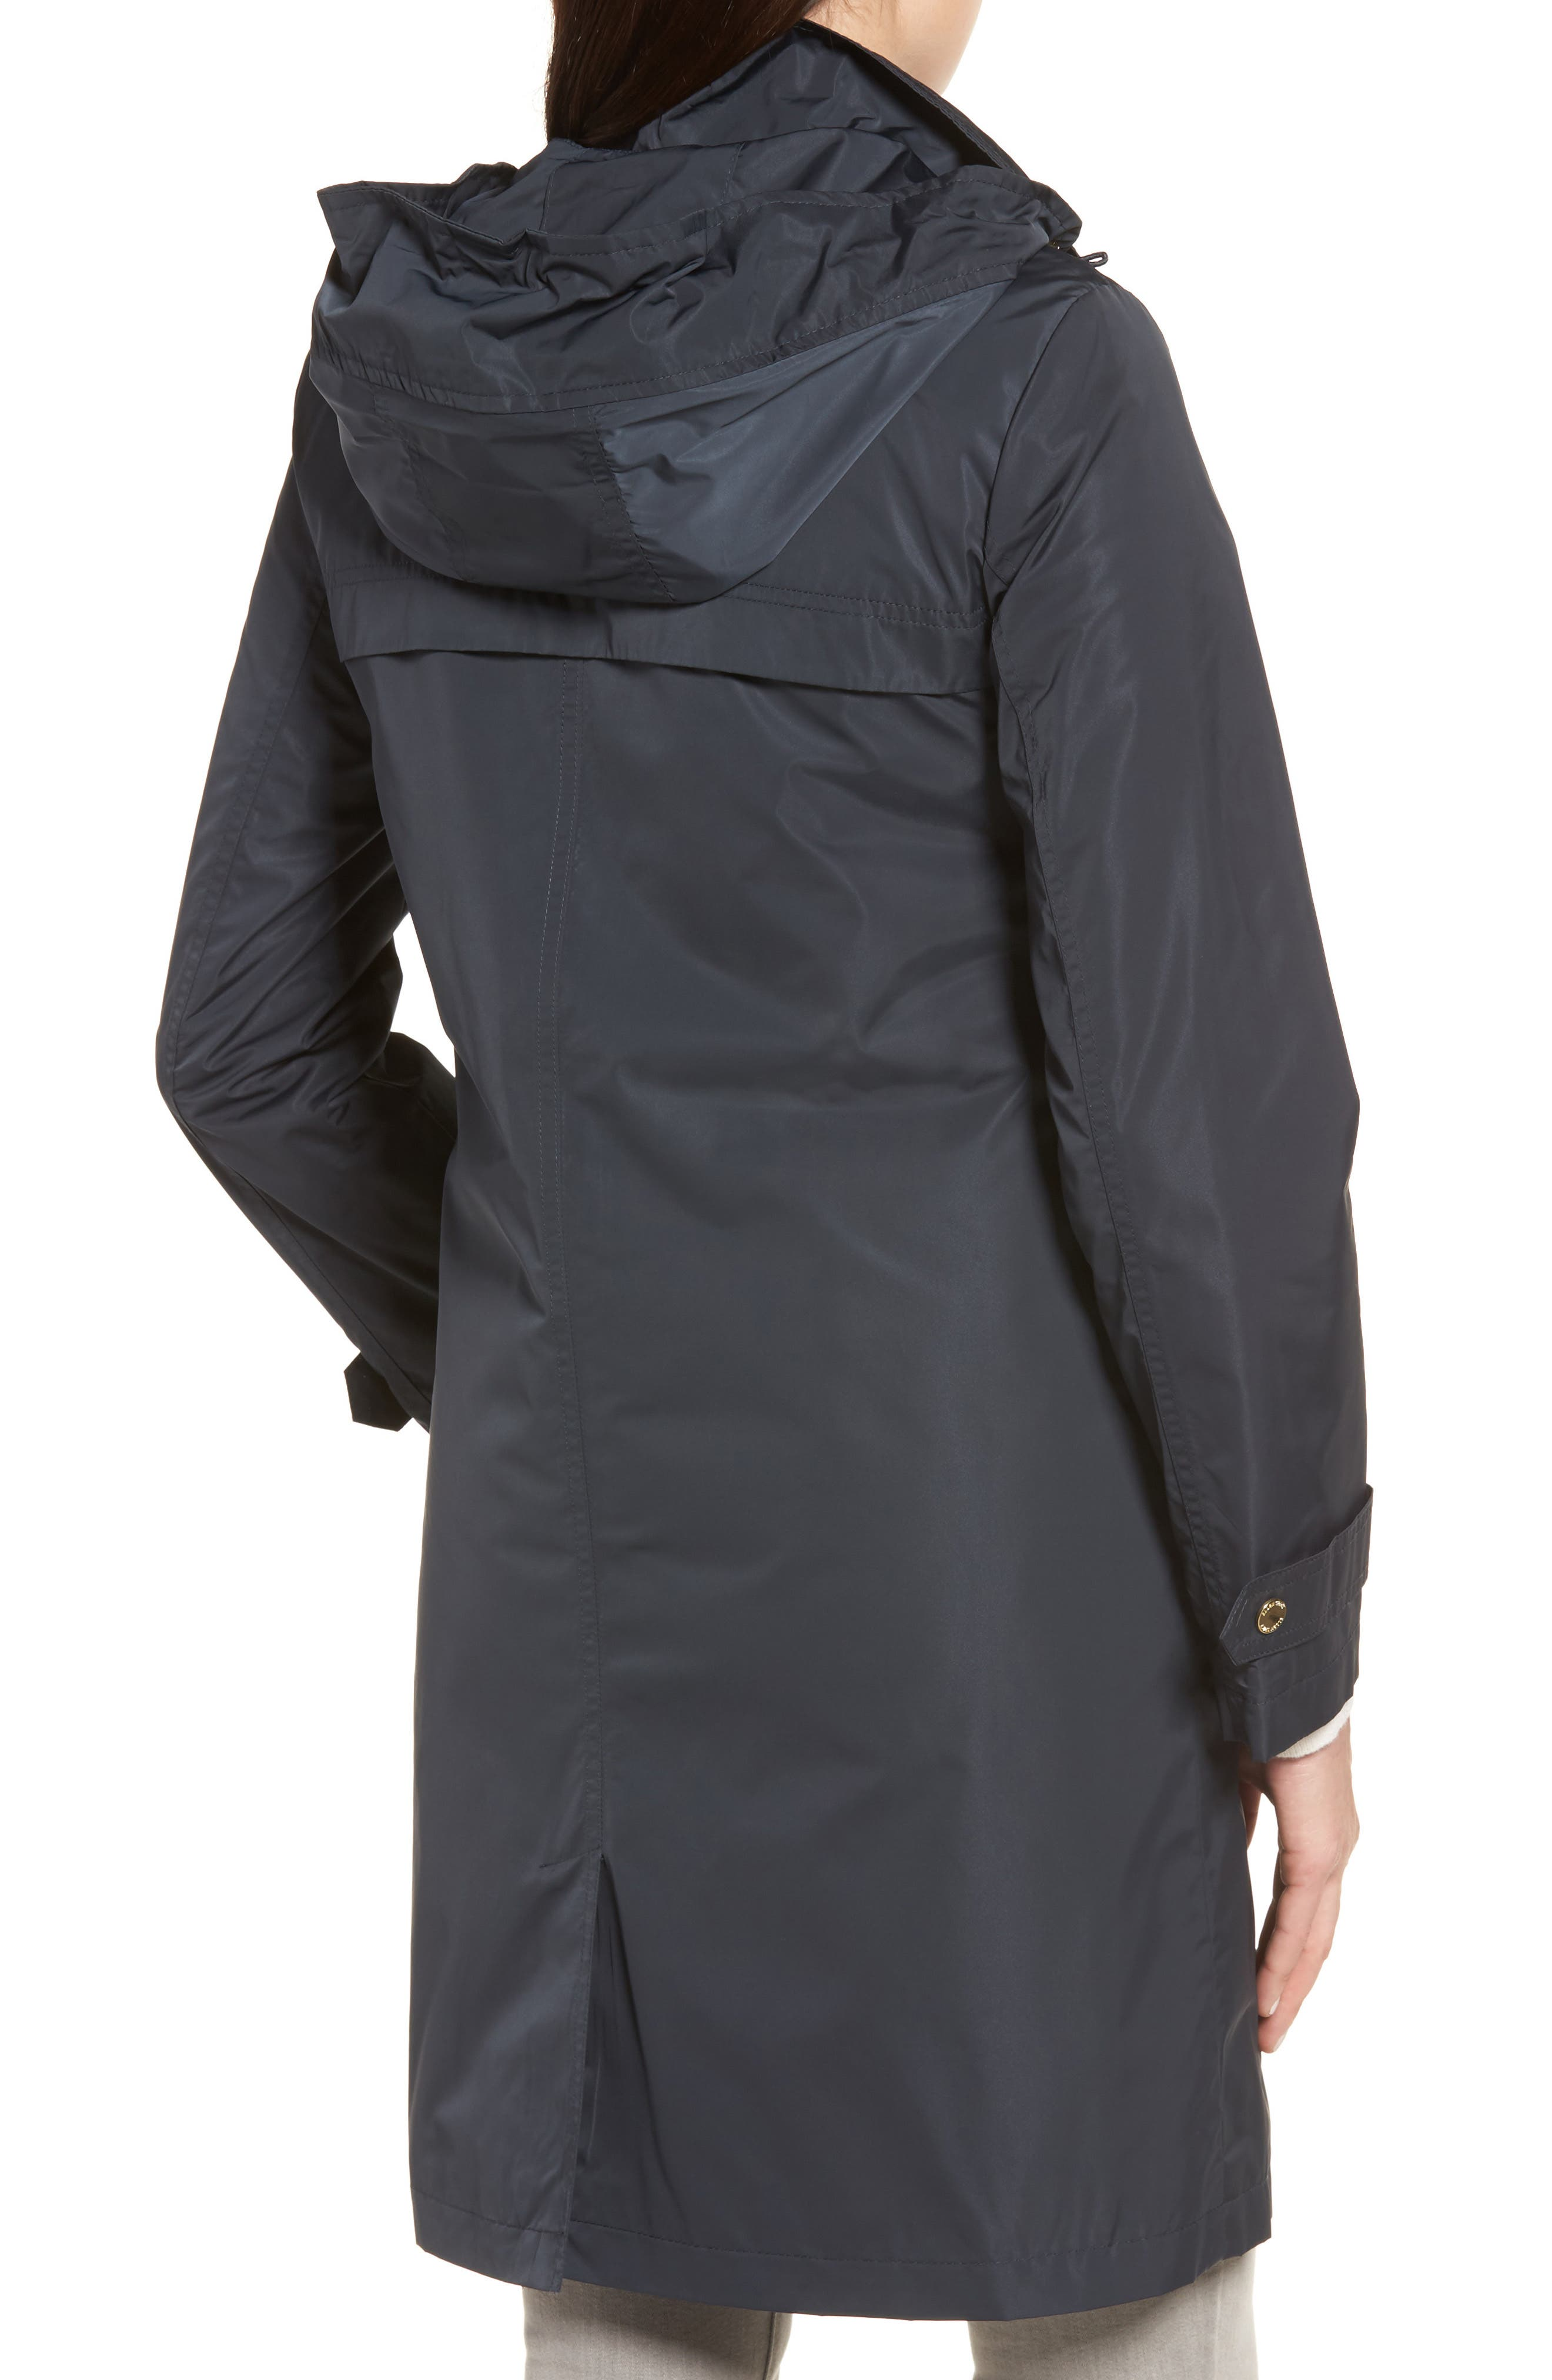 ELLEN TRACY,                             Raincoat with Detachable Hood,                             Alternate thumbnail 2, color,                             410